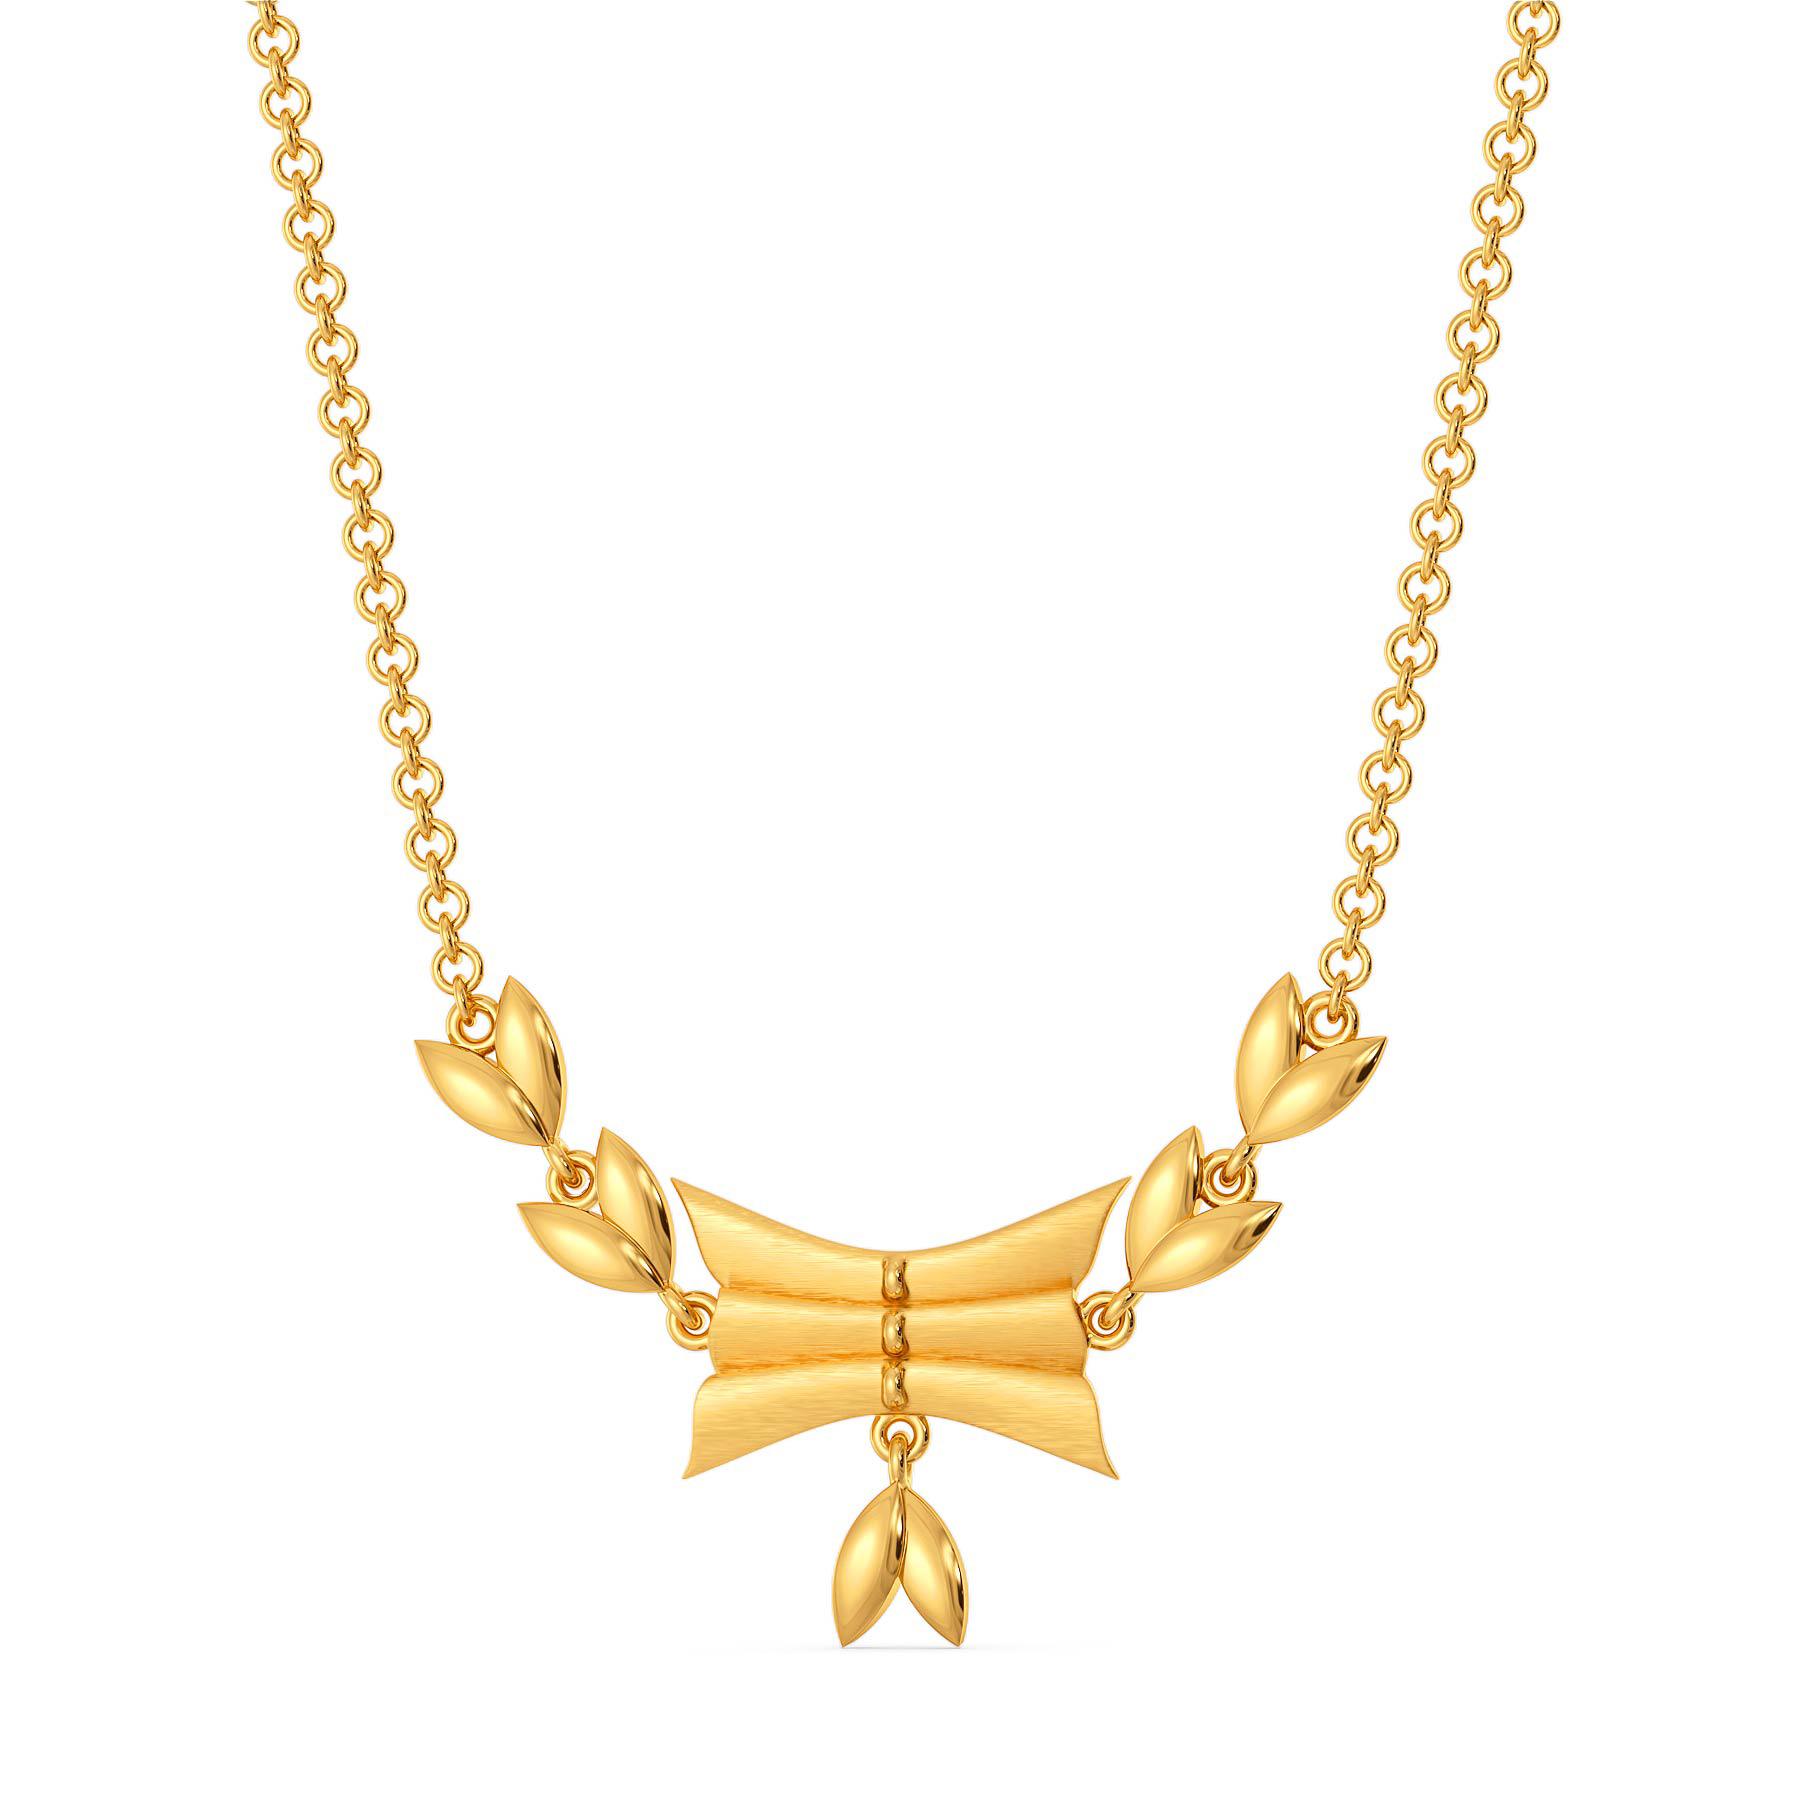 Ruff No Fuss Gold Necklaces